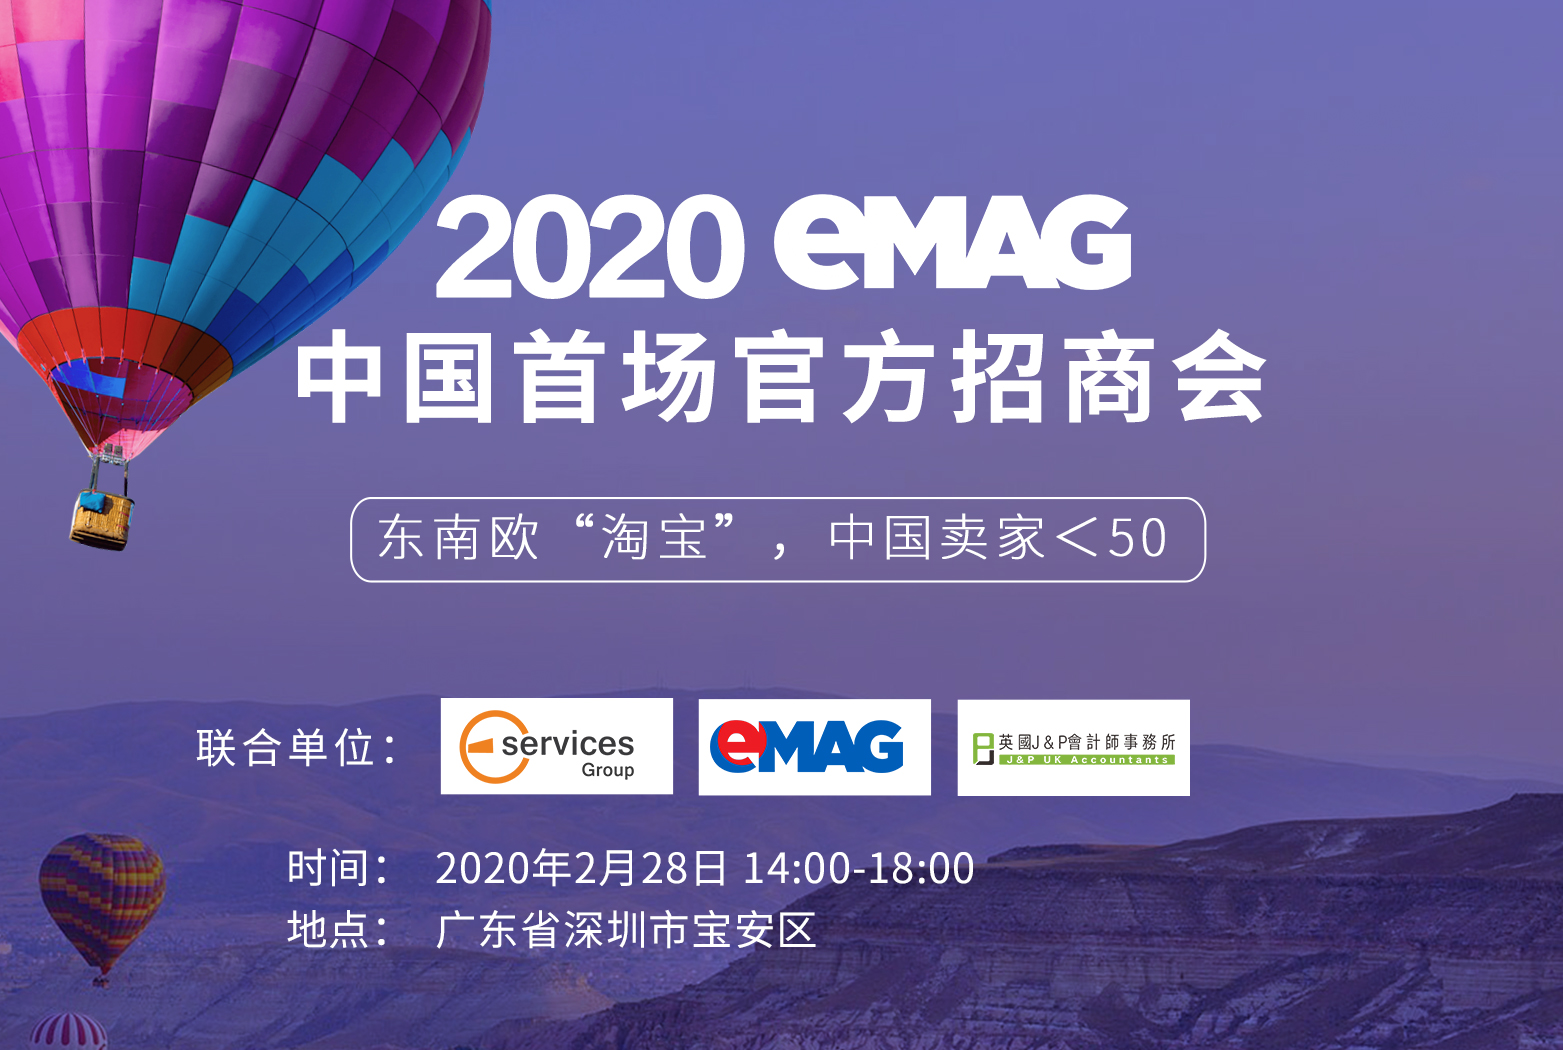 2020 eMAG中國首場官方招商會